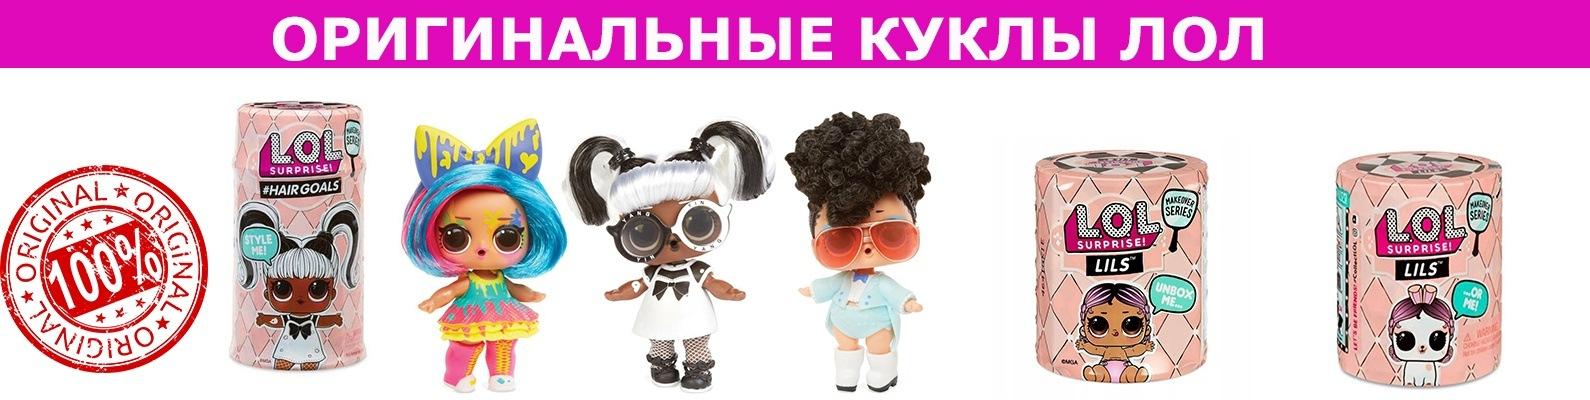 Куклы ЛОЛ СЮРПРИЗЫ - Мультик ДЕТСКИЙ САД LOL